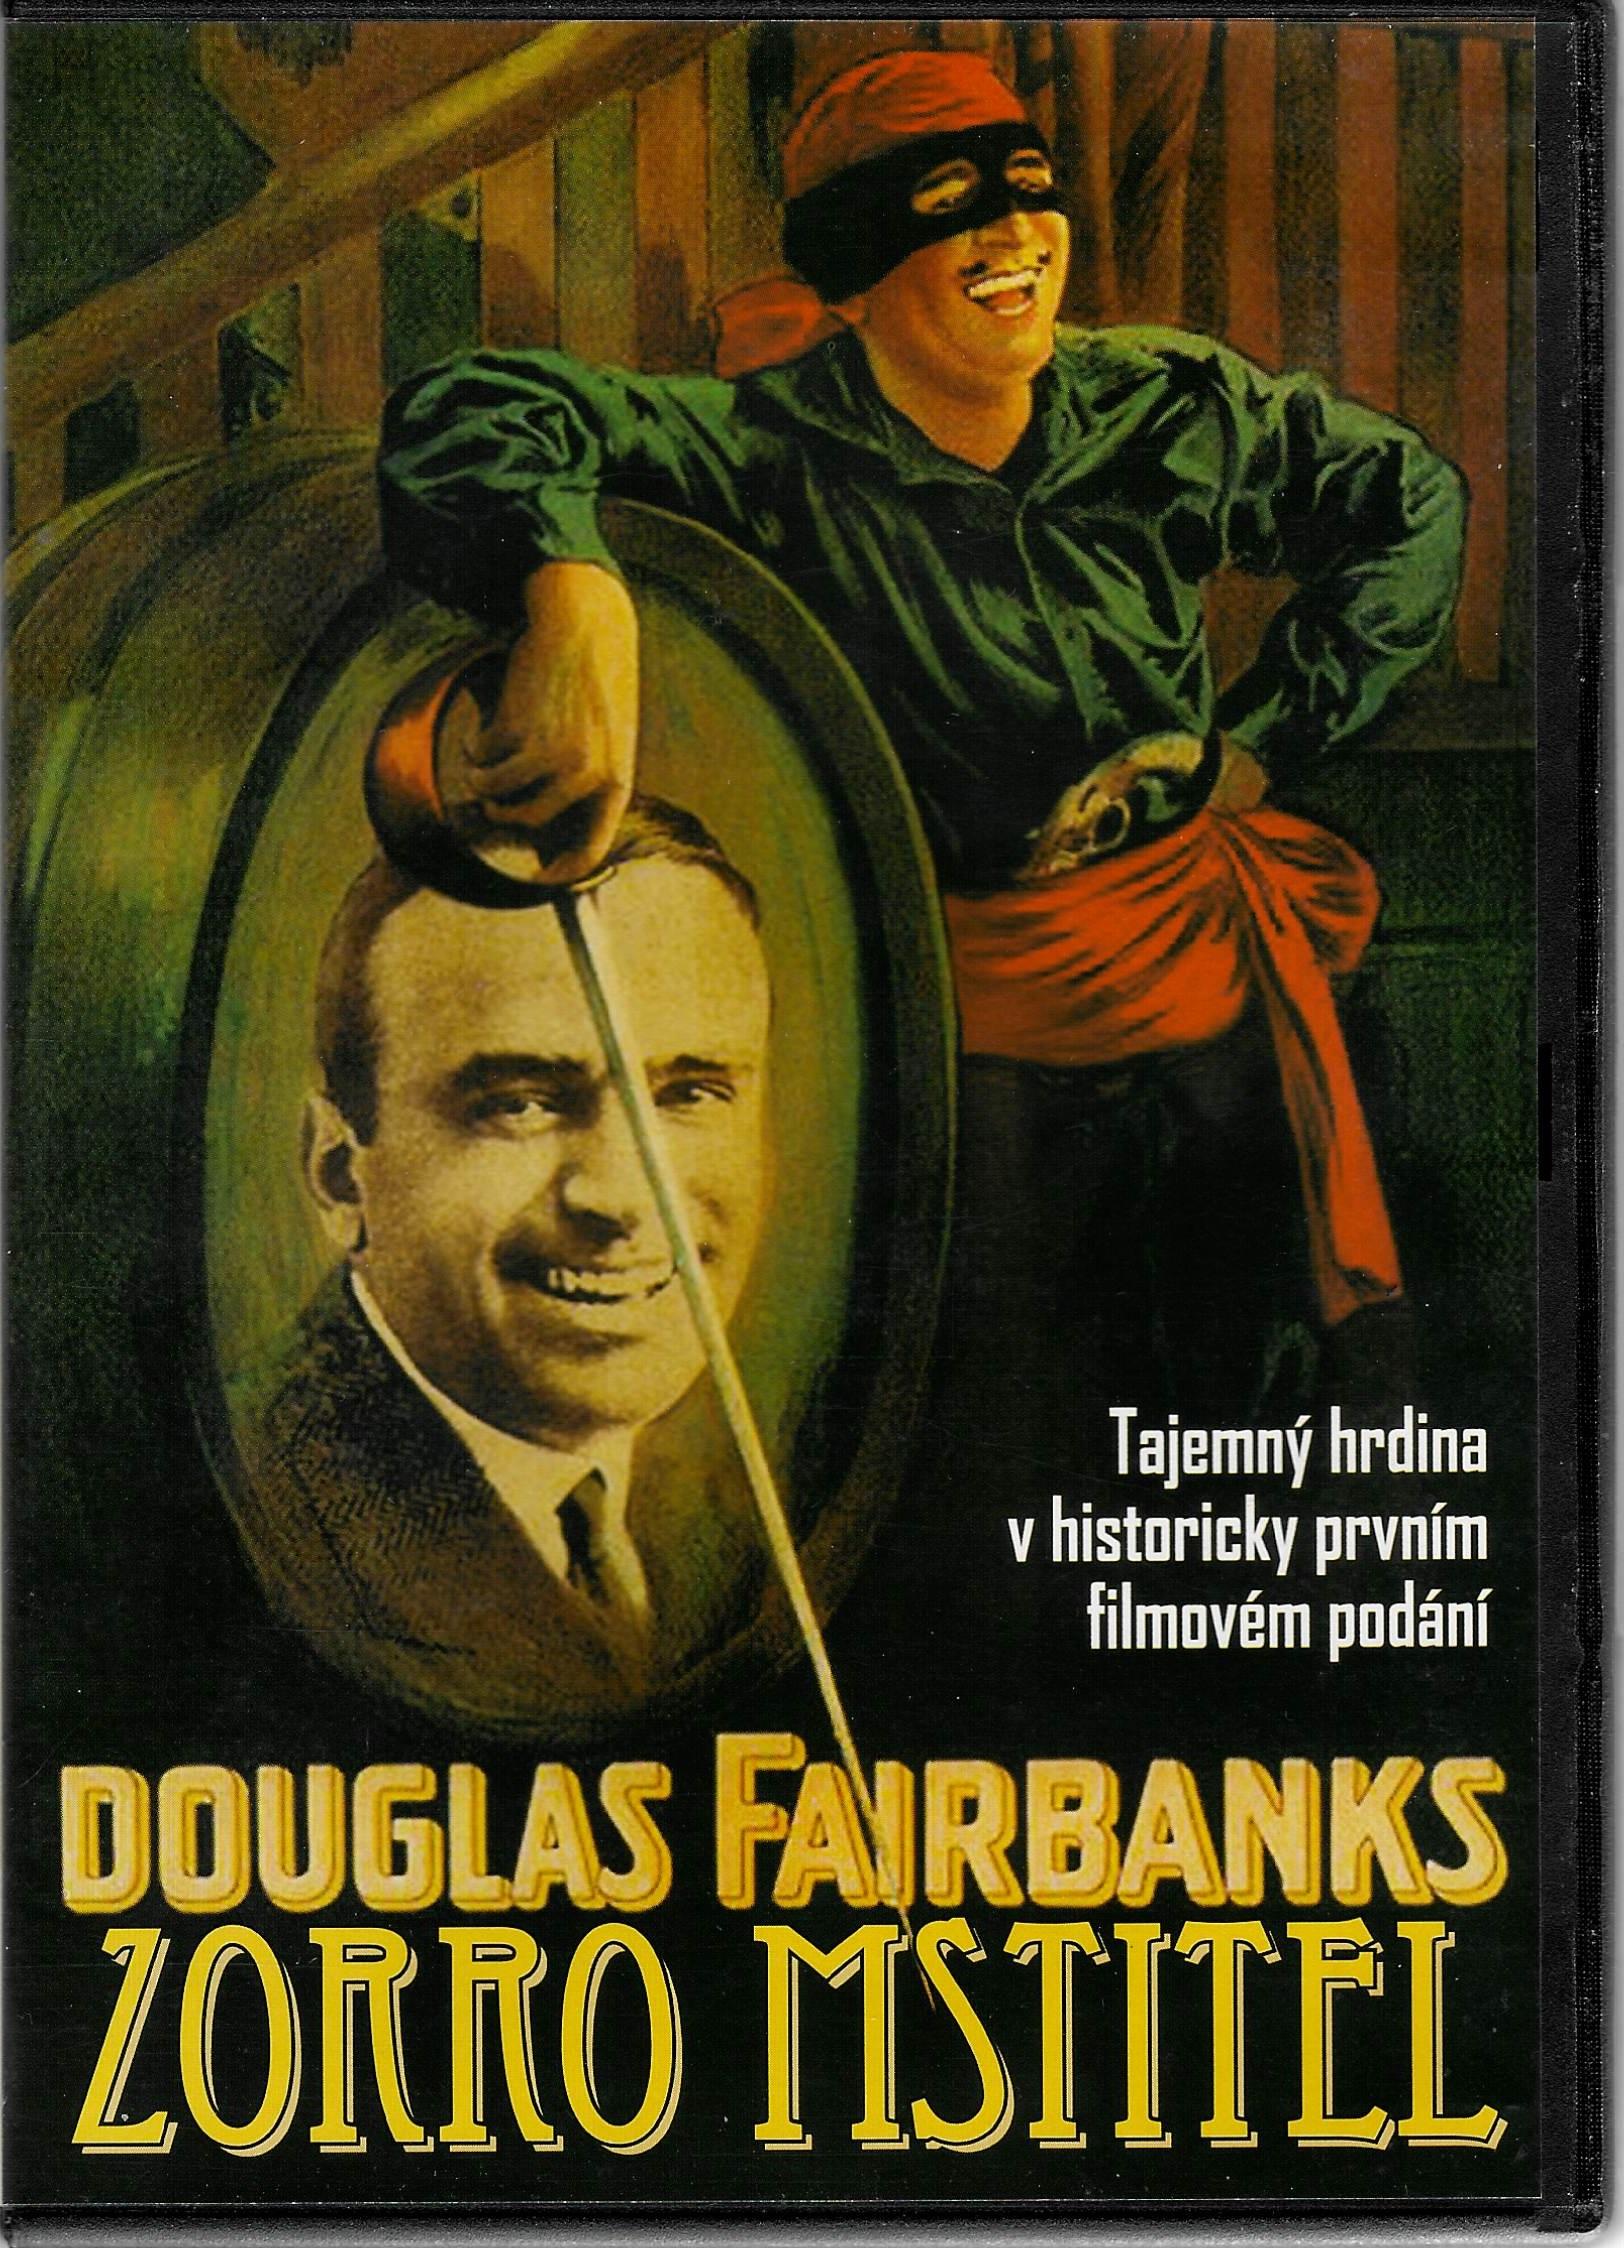 Zorro mstitel ( Douglas Fairbanks) - DVD plast